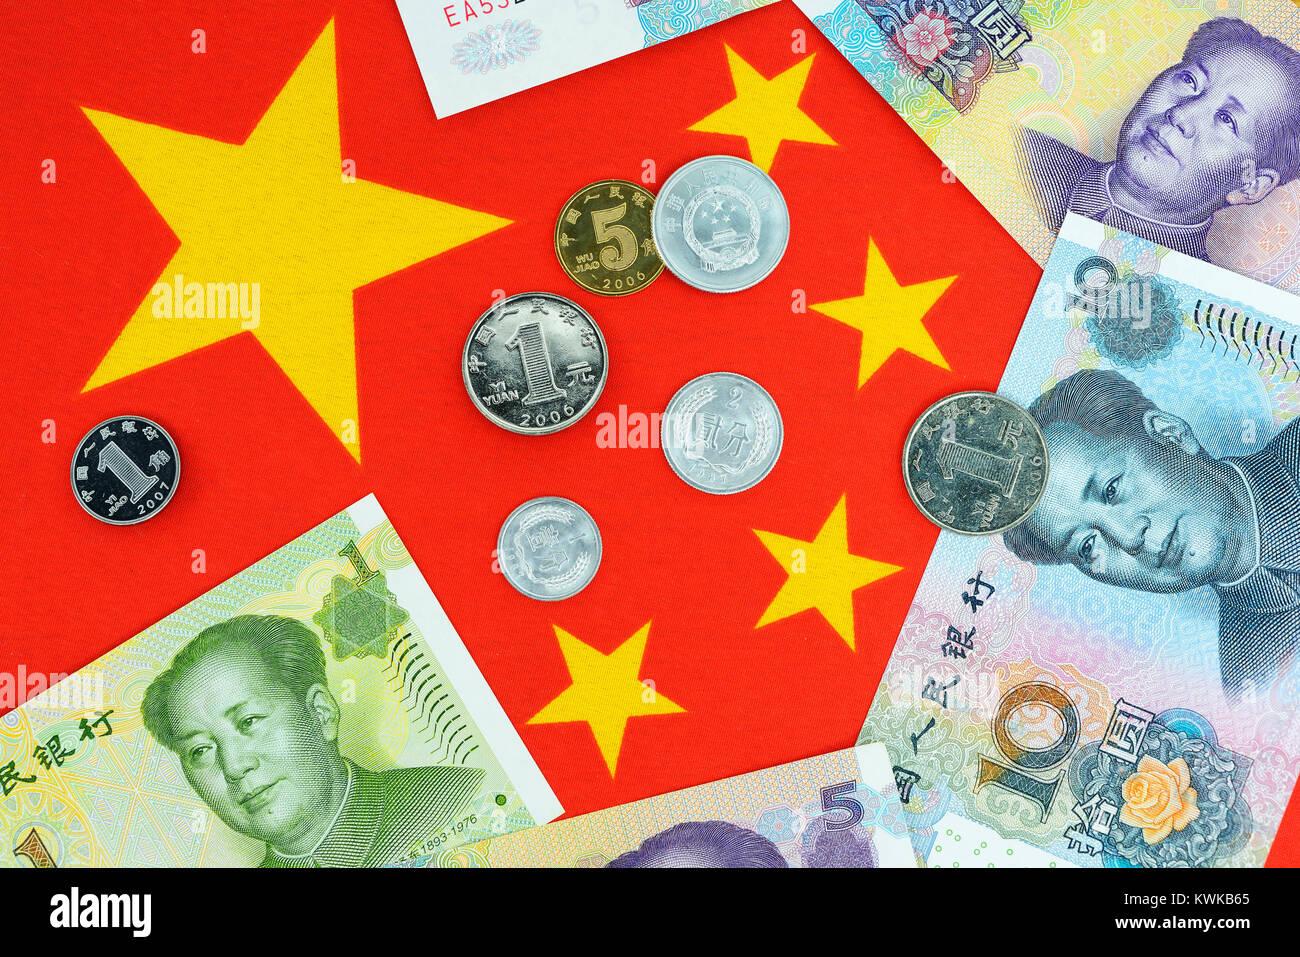 Chinese currency Renminbi on the Chinese national flag, Chinesische W?hrung Renminbi auf der chinesischen Nationalflagge - Stock Image